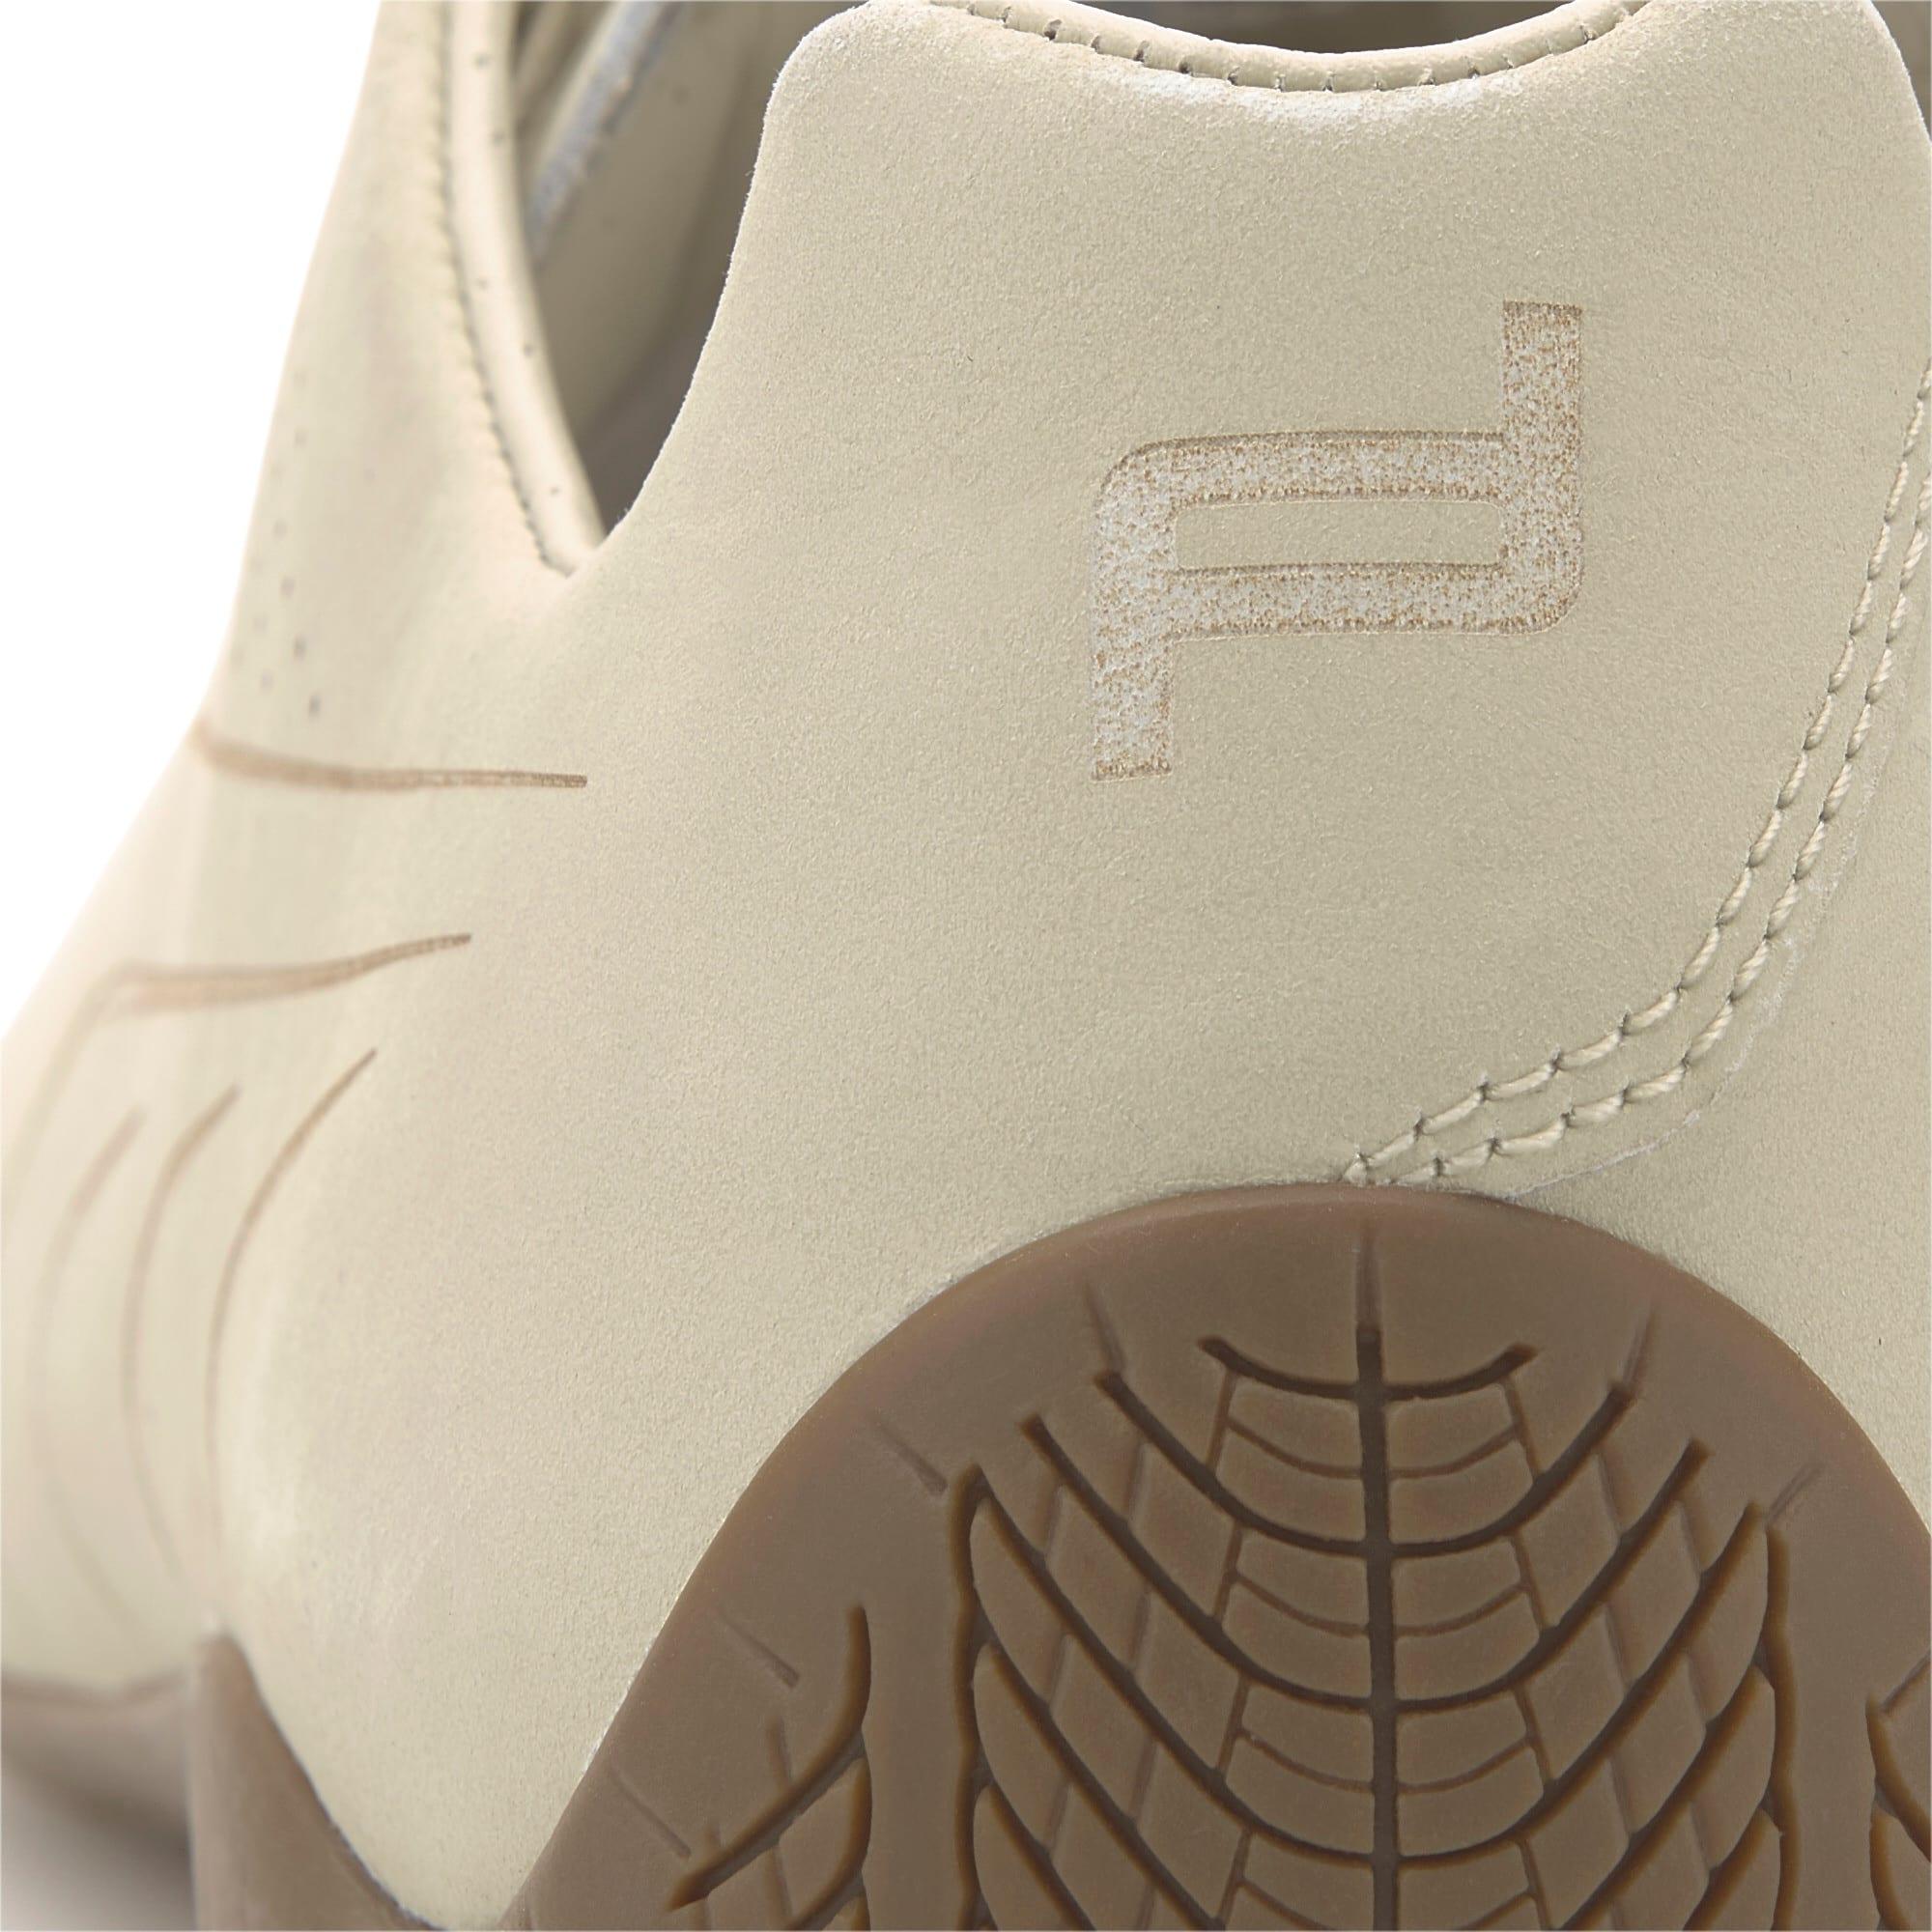 Thumbnail 7 of Porsche Design Speedcat Lux Nubuck Men's Shoes, Overcast-Overcast, medium